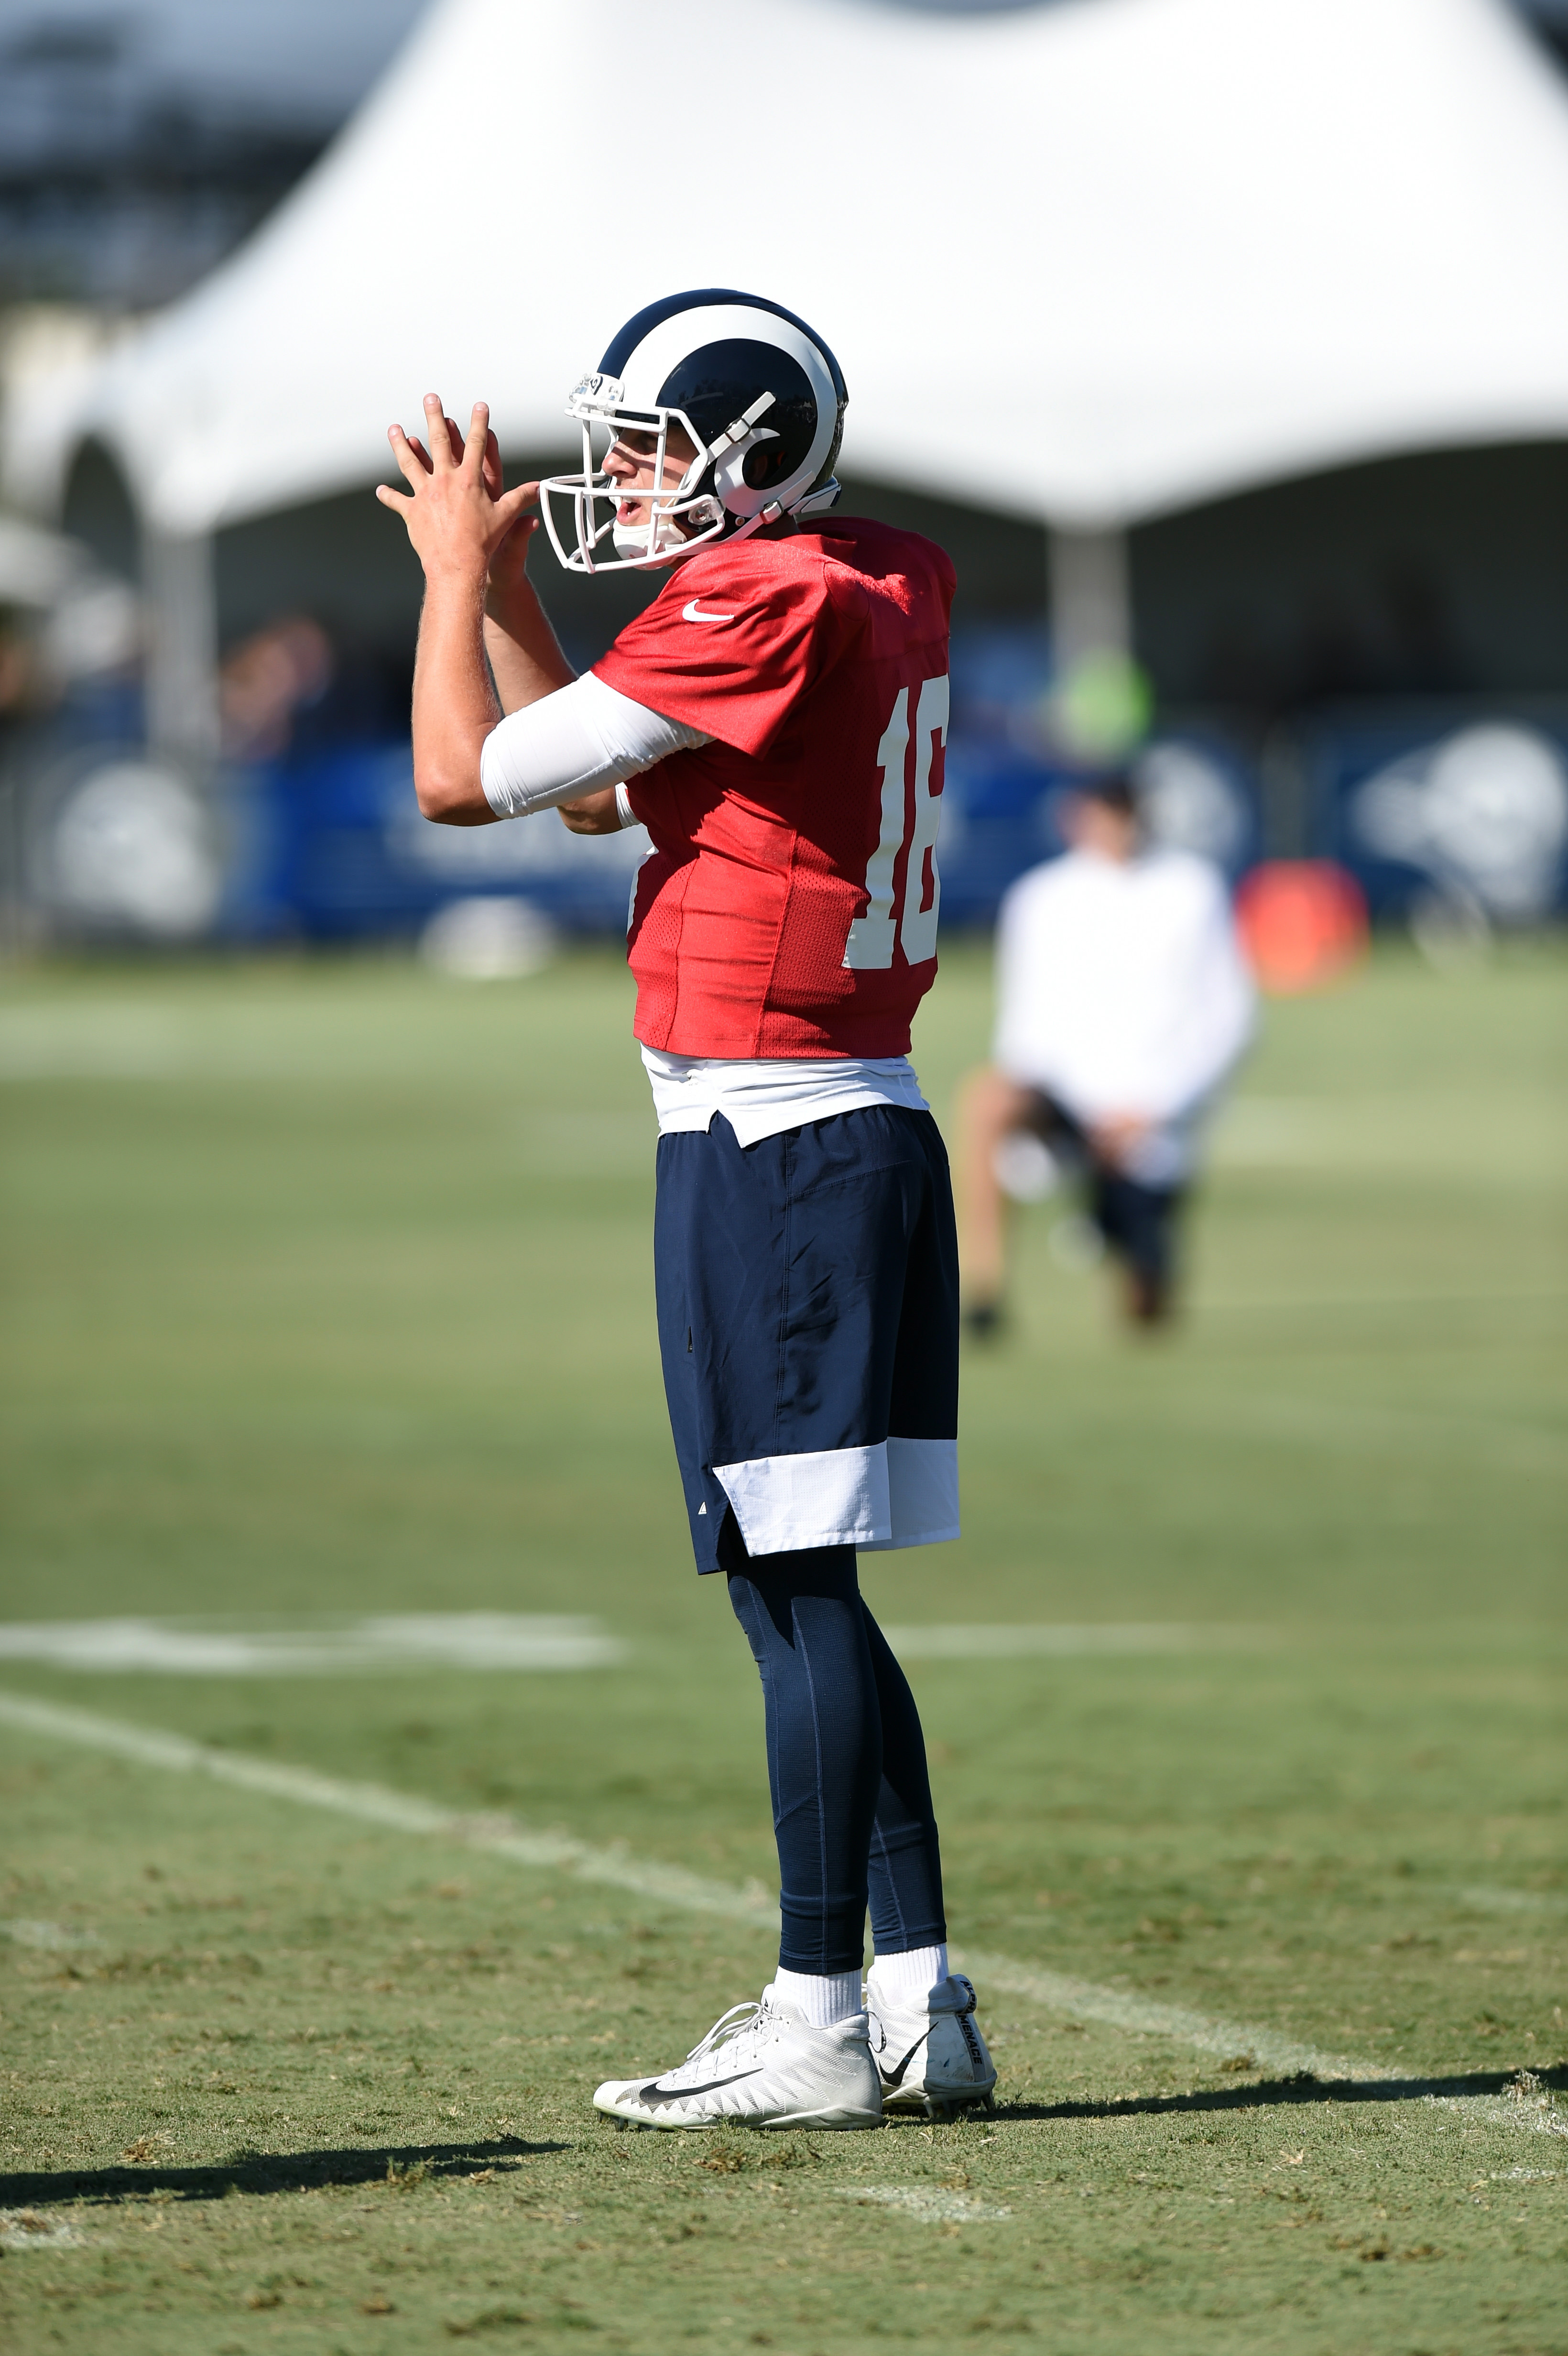 NFL: JUL 29 Rams Training Camp